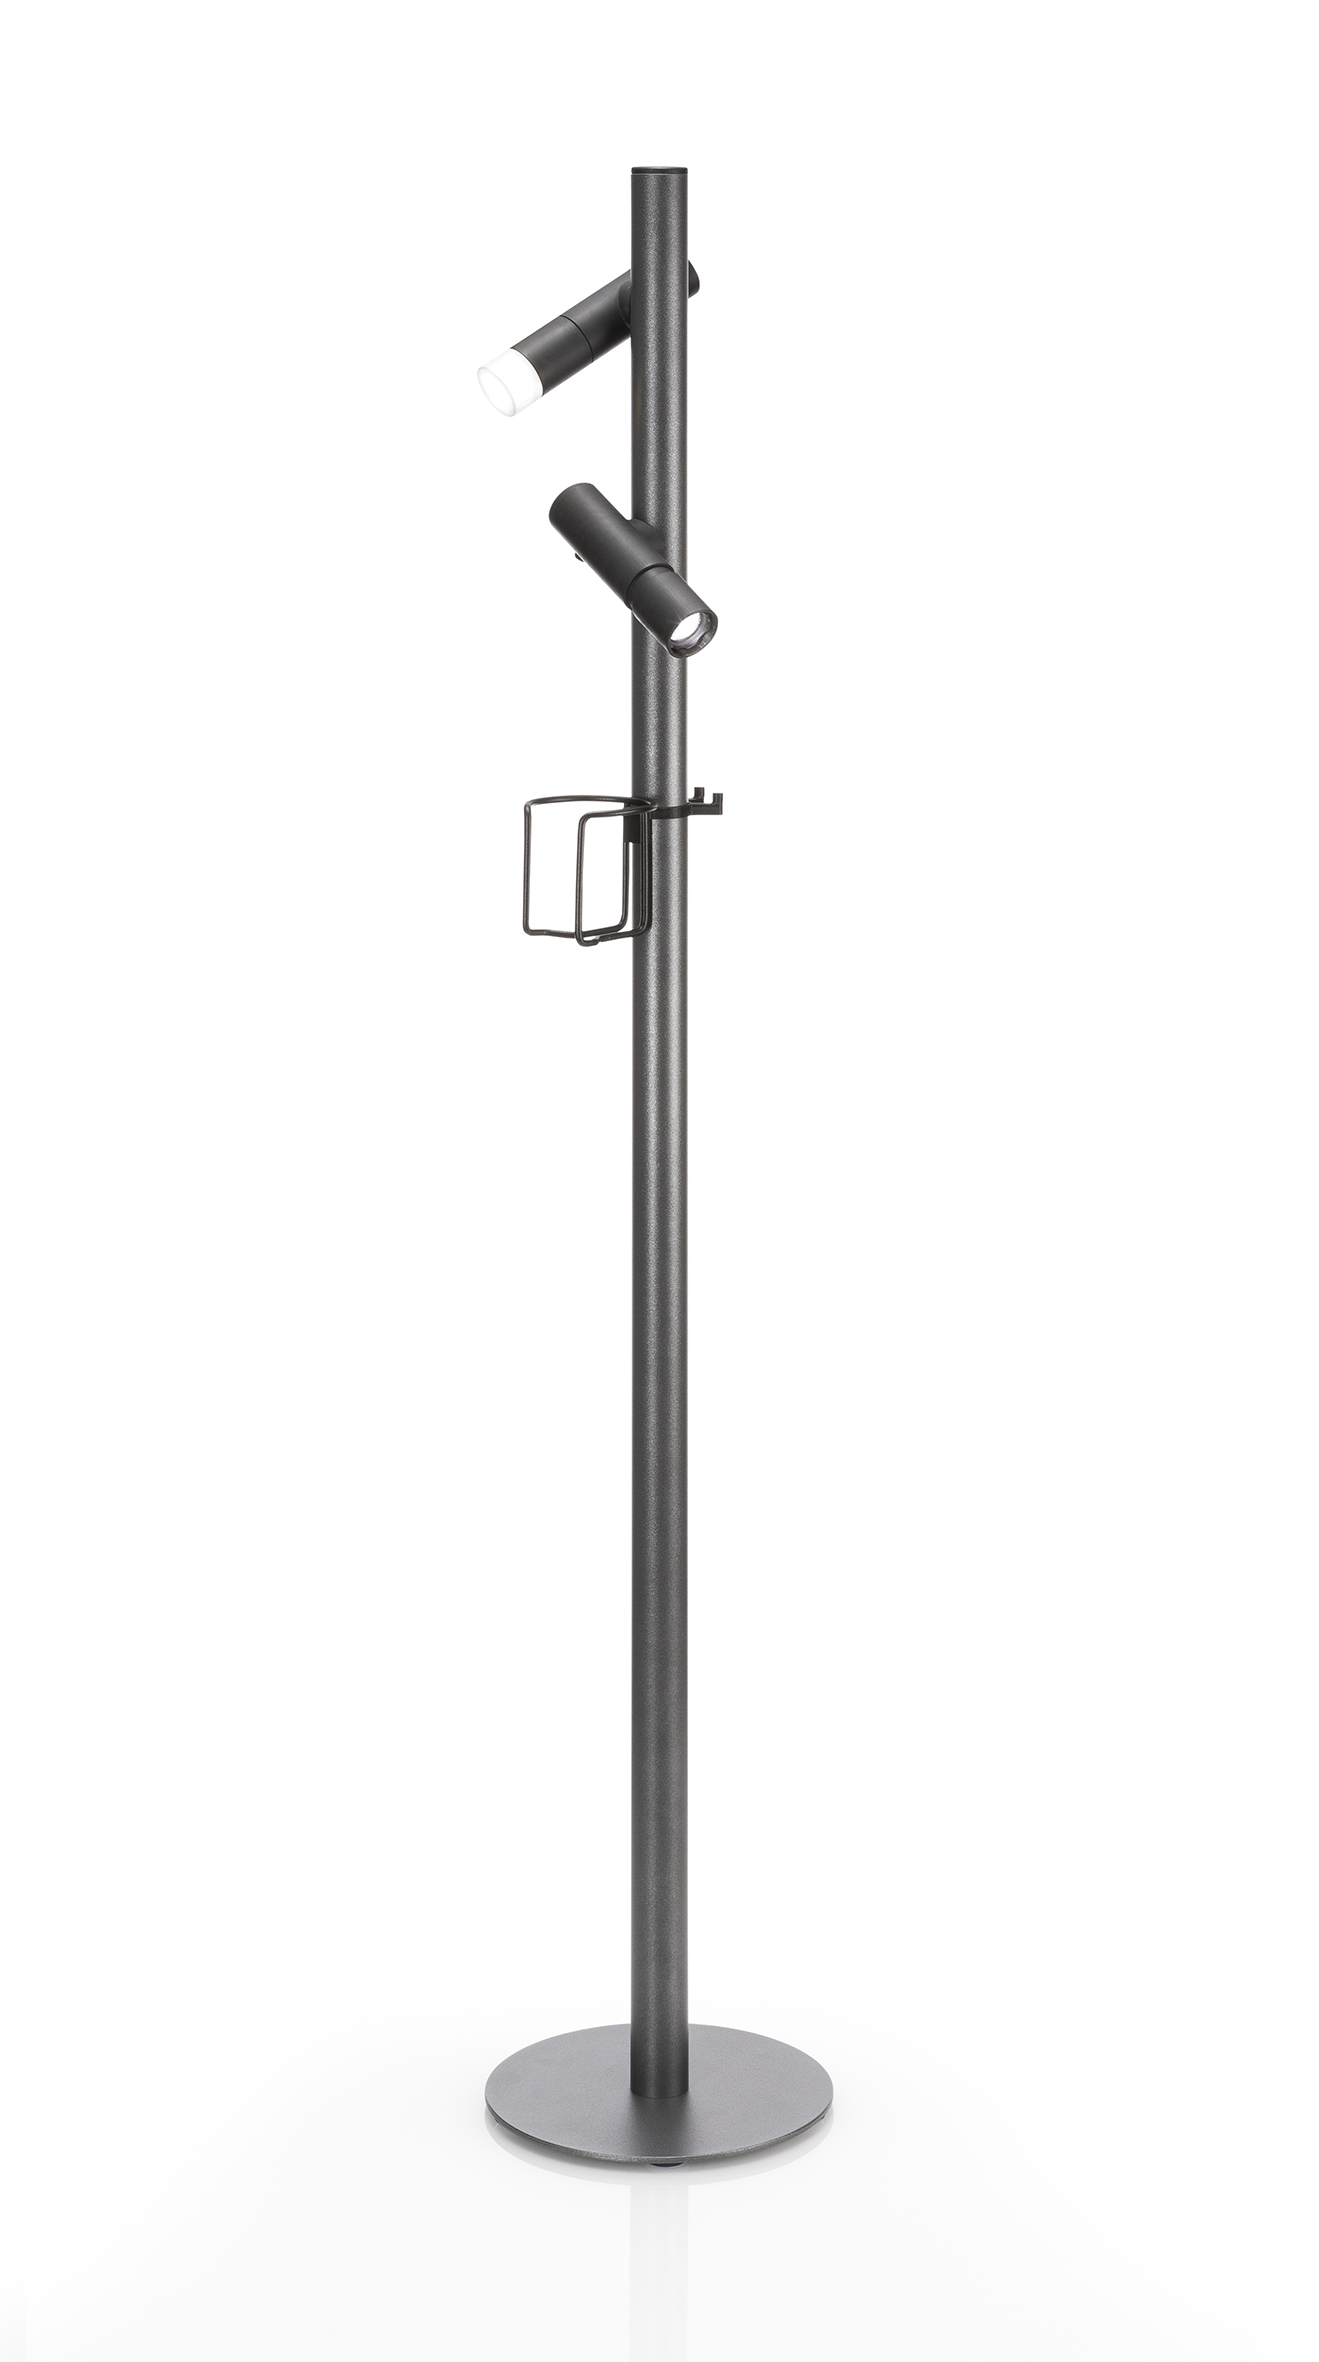 Outdoorleuchte PAUL BASIC+ Lampe